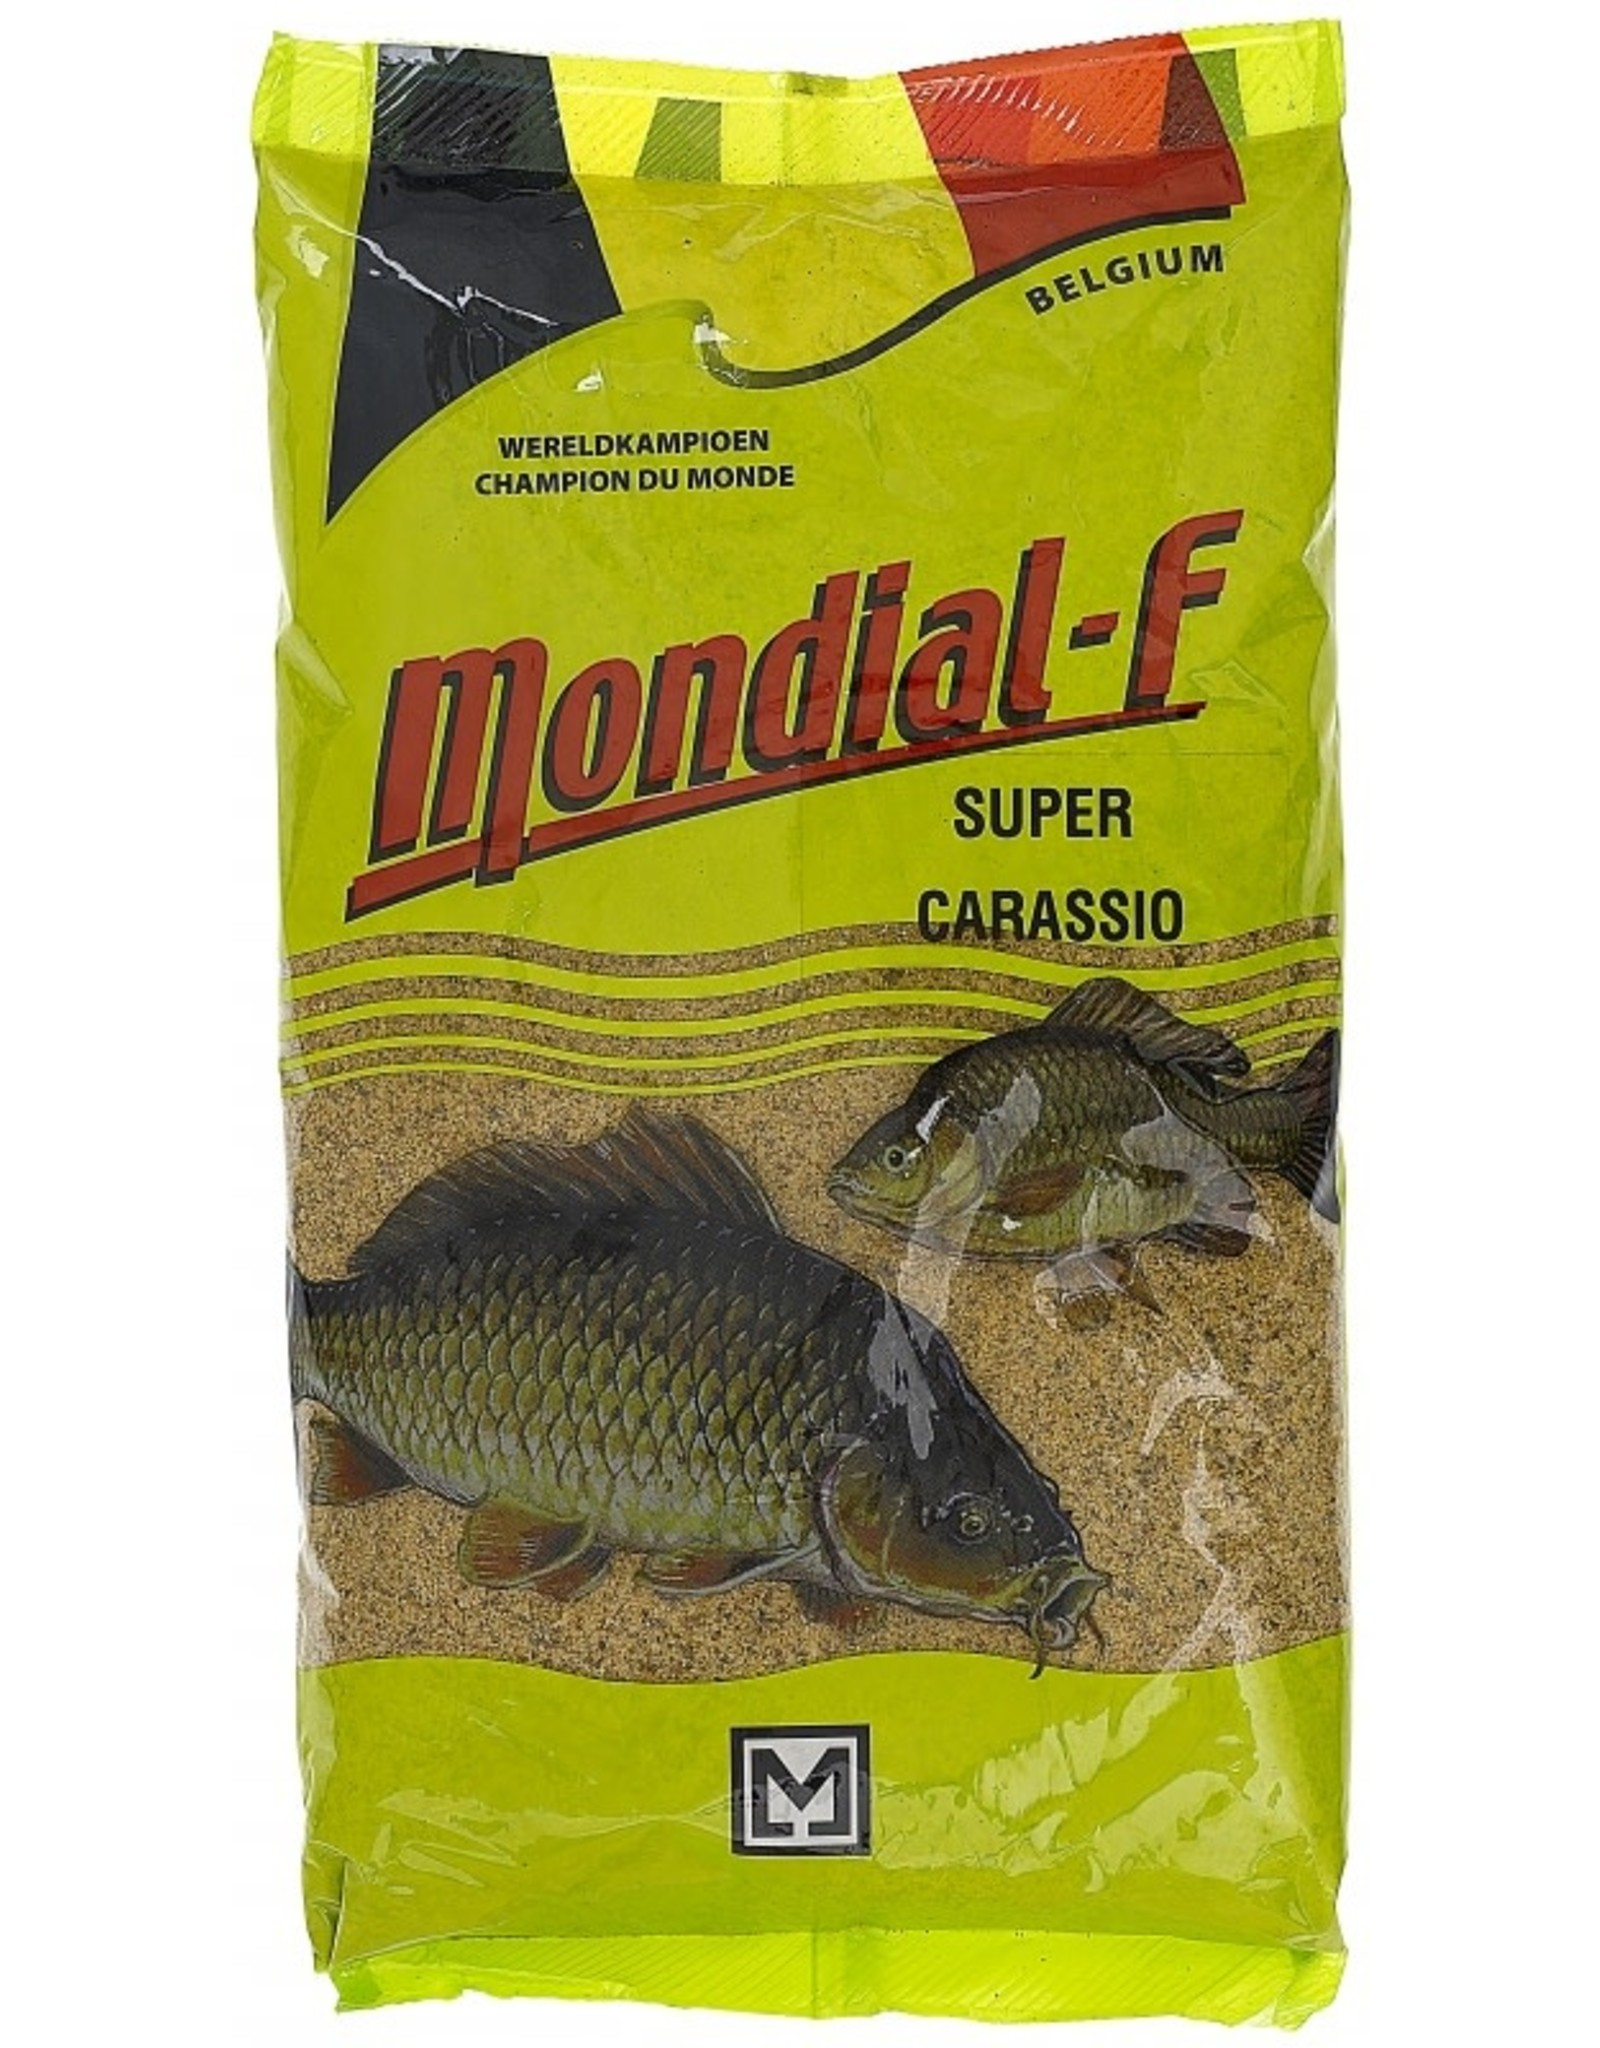 MONDIAL-F SUPER CARASSIO 1KG